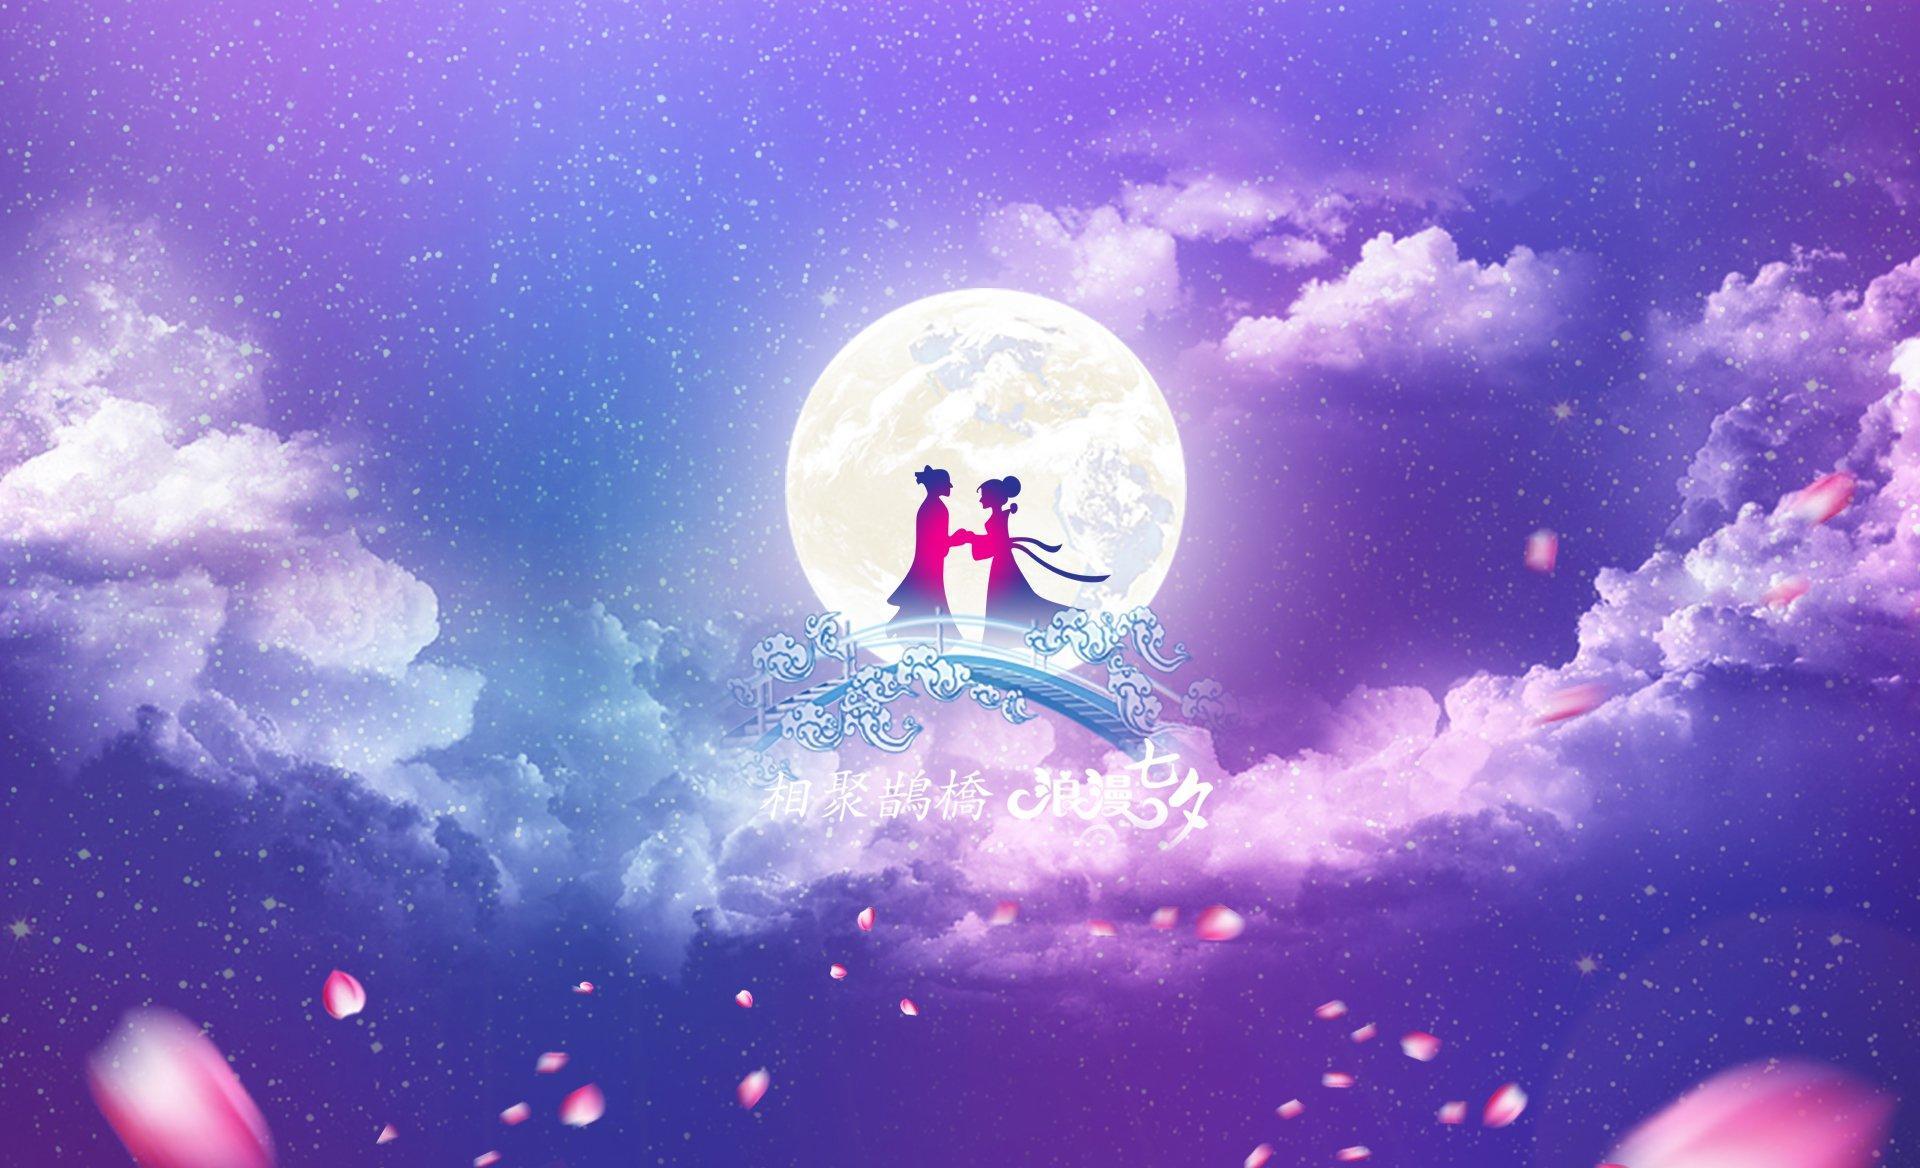 <b>七夕节话情感——爱情的刻骨铭心与爱情的平平淡淡那种更好呢?</b>